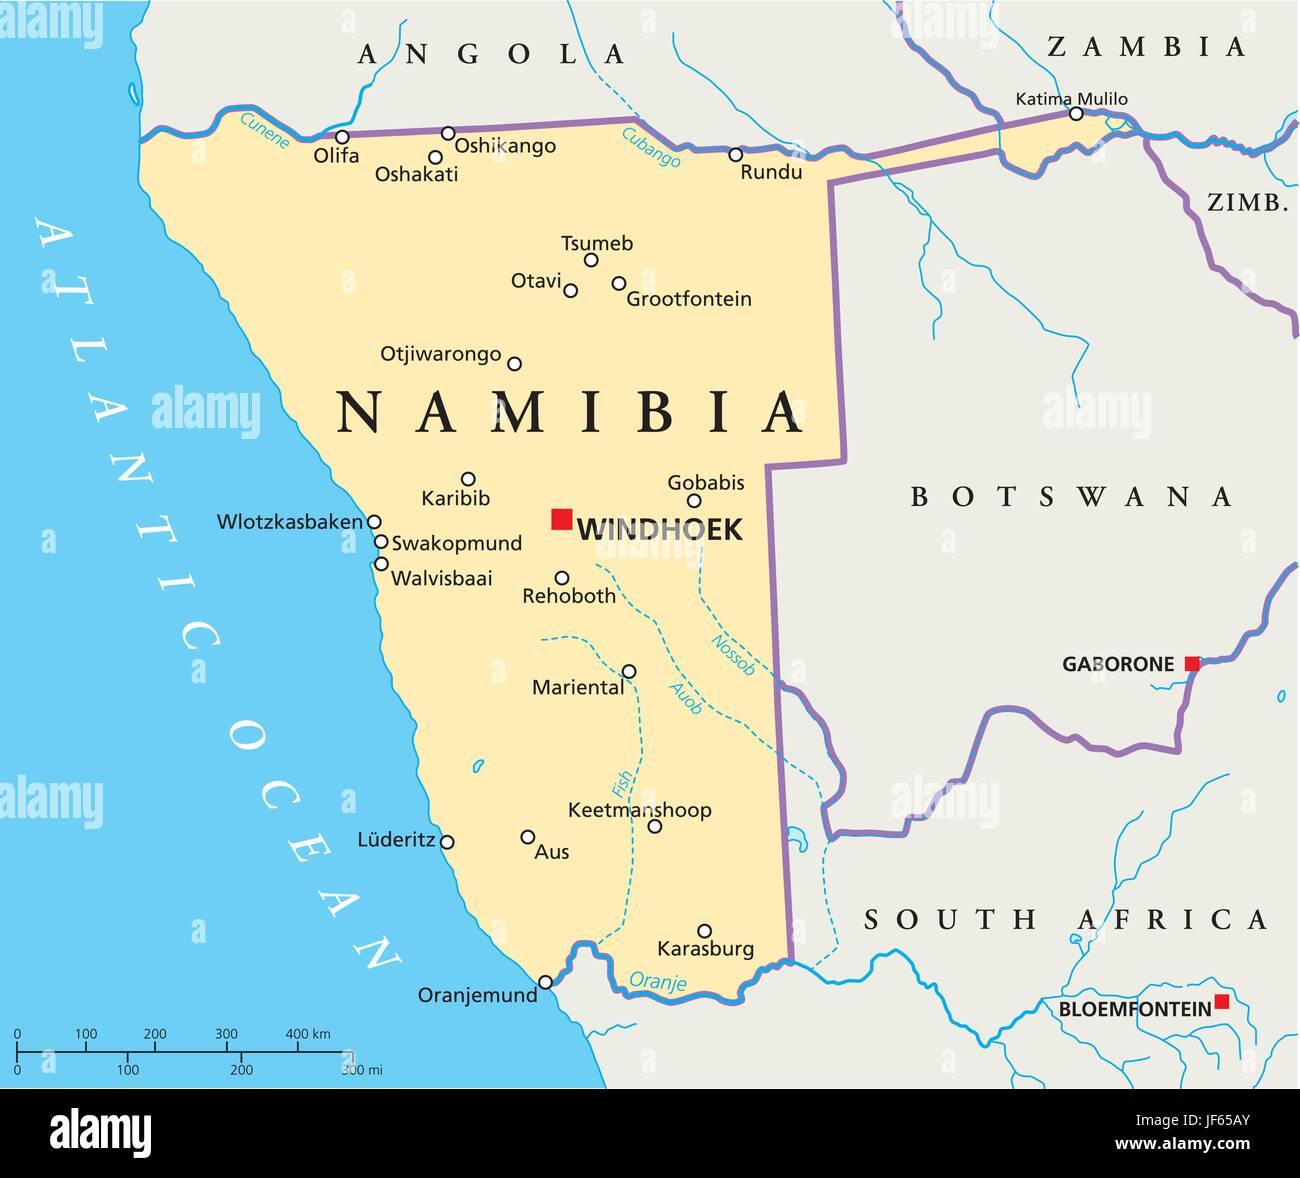 namibia map atlas map of the world travel desert wasteland